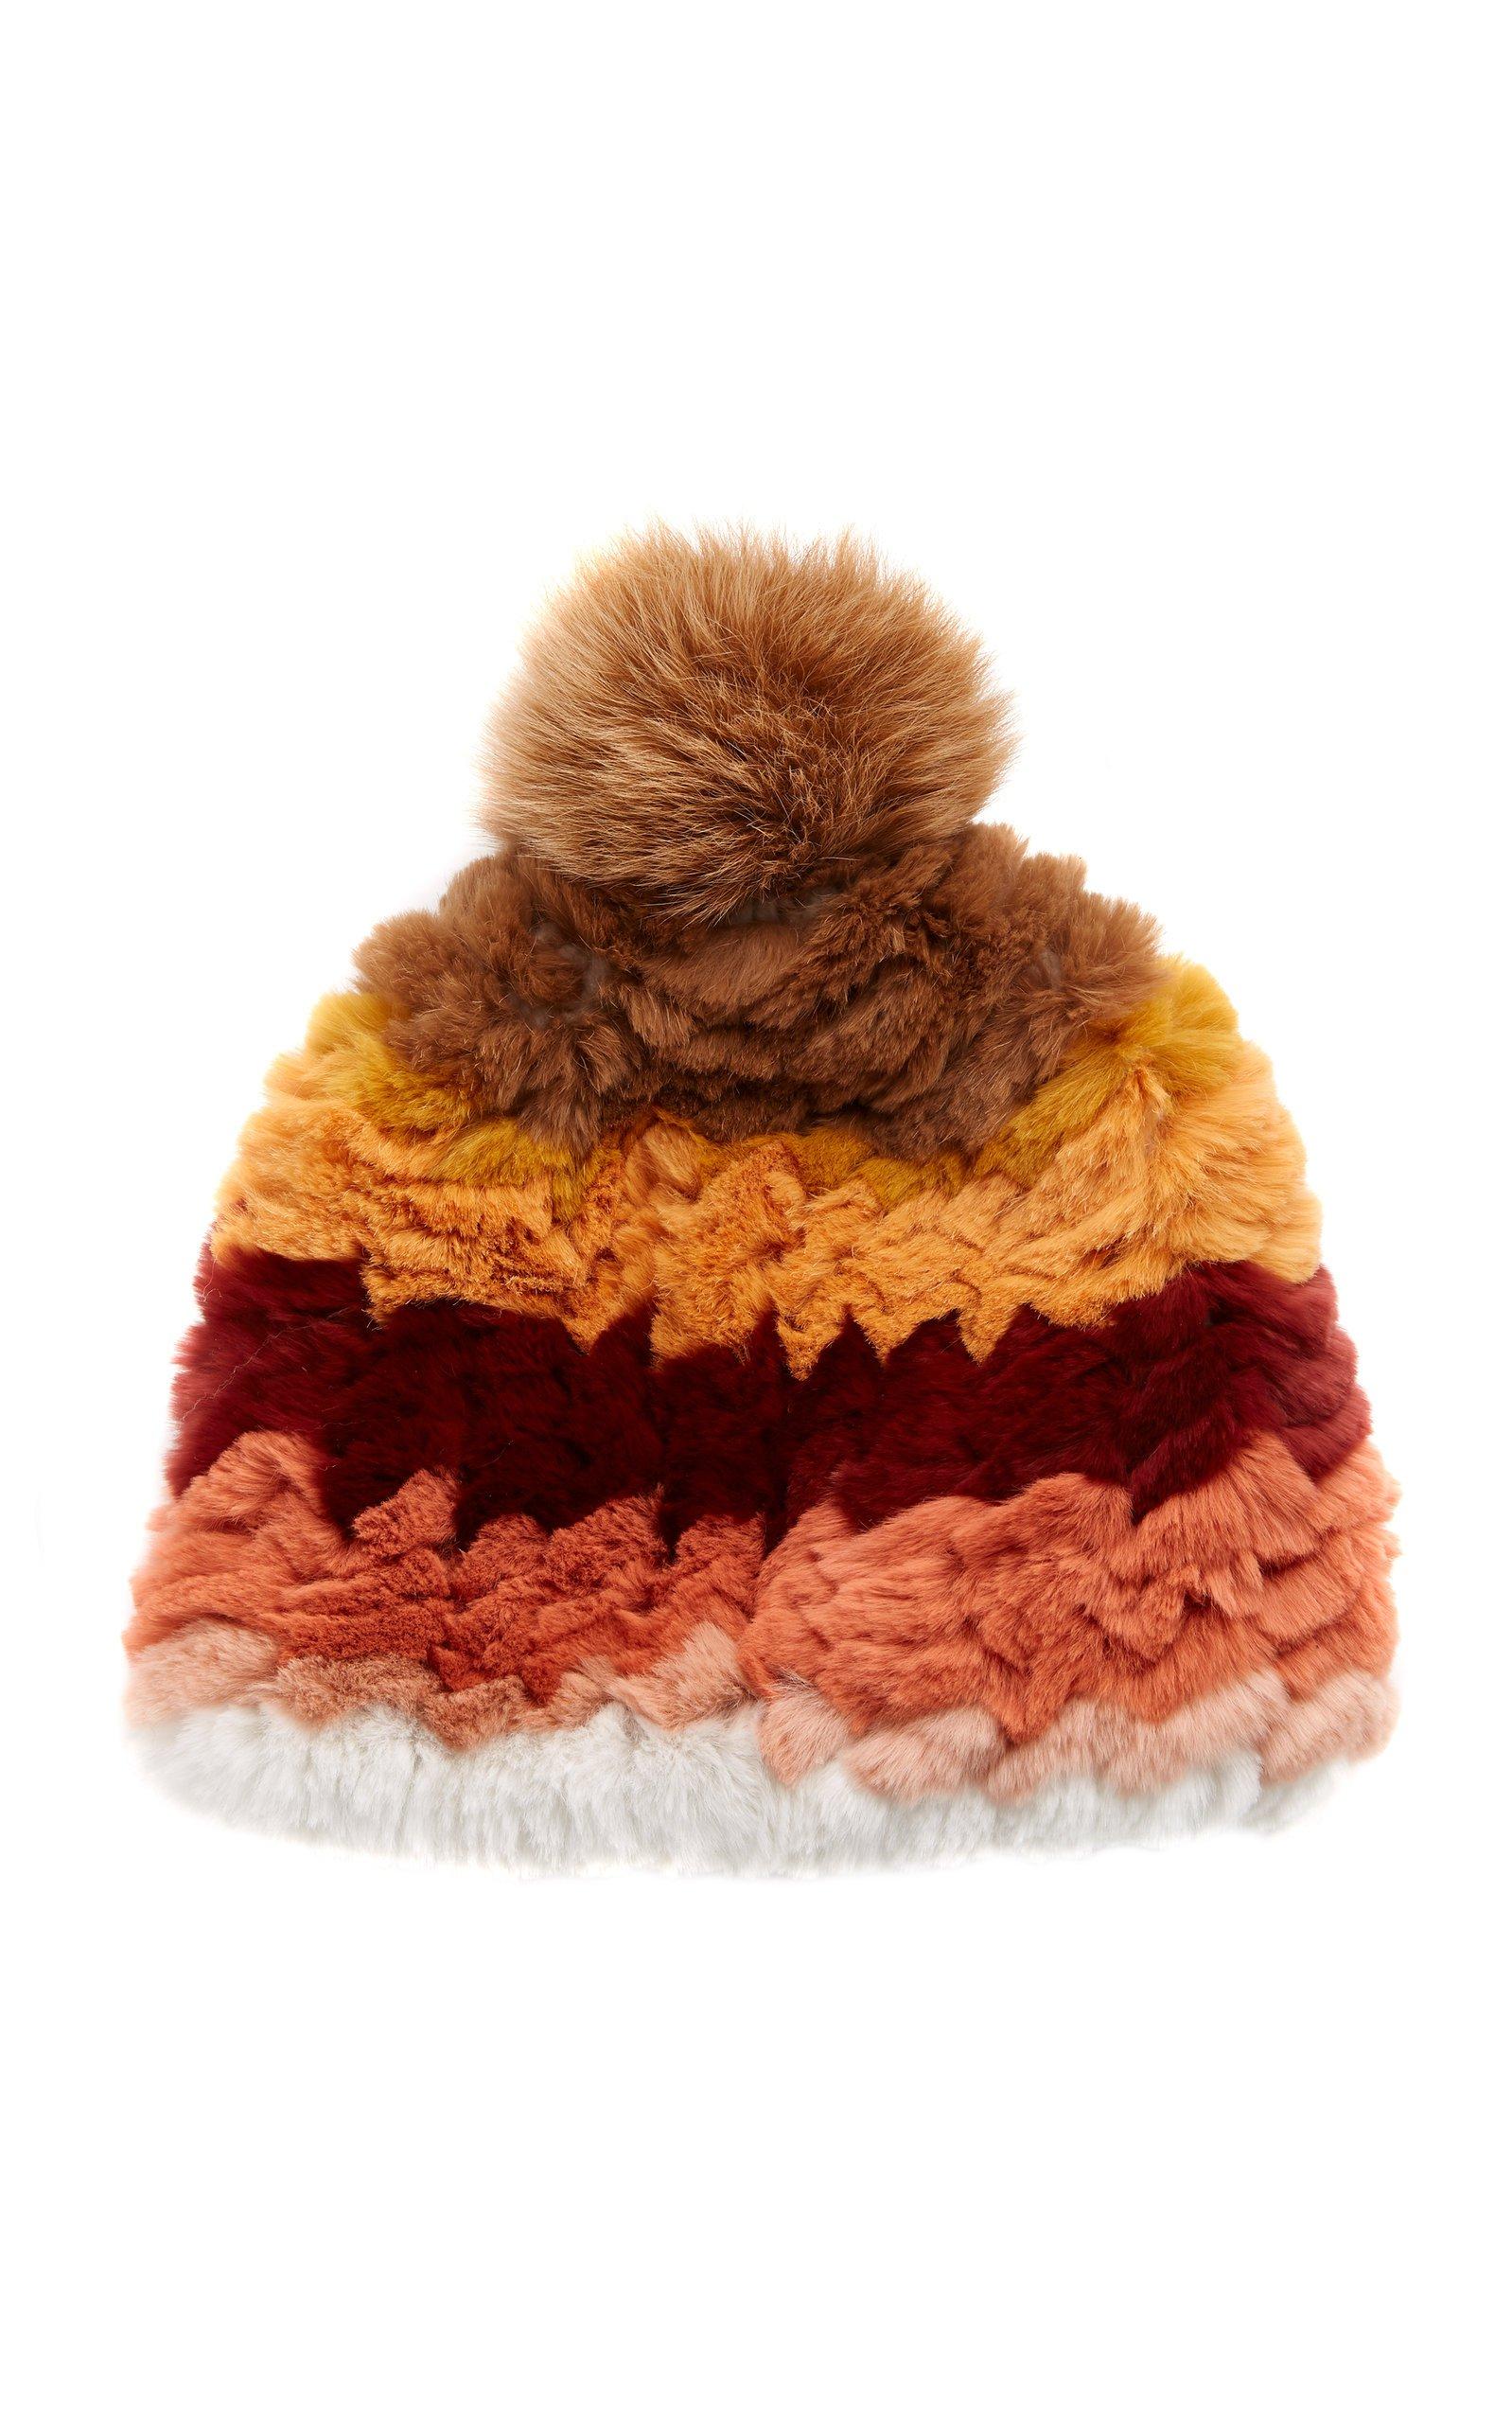 Knitted Rabbit And Fox Pom-Pom Hat by Pologeorgis | Moda Operandi